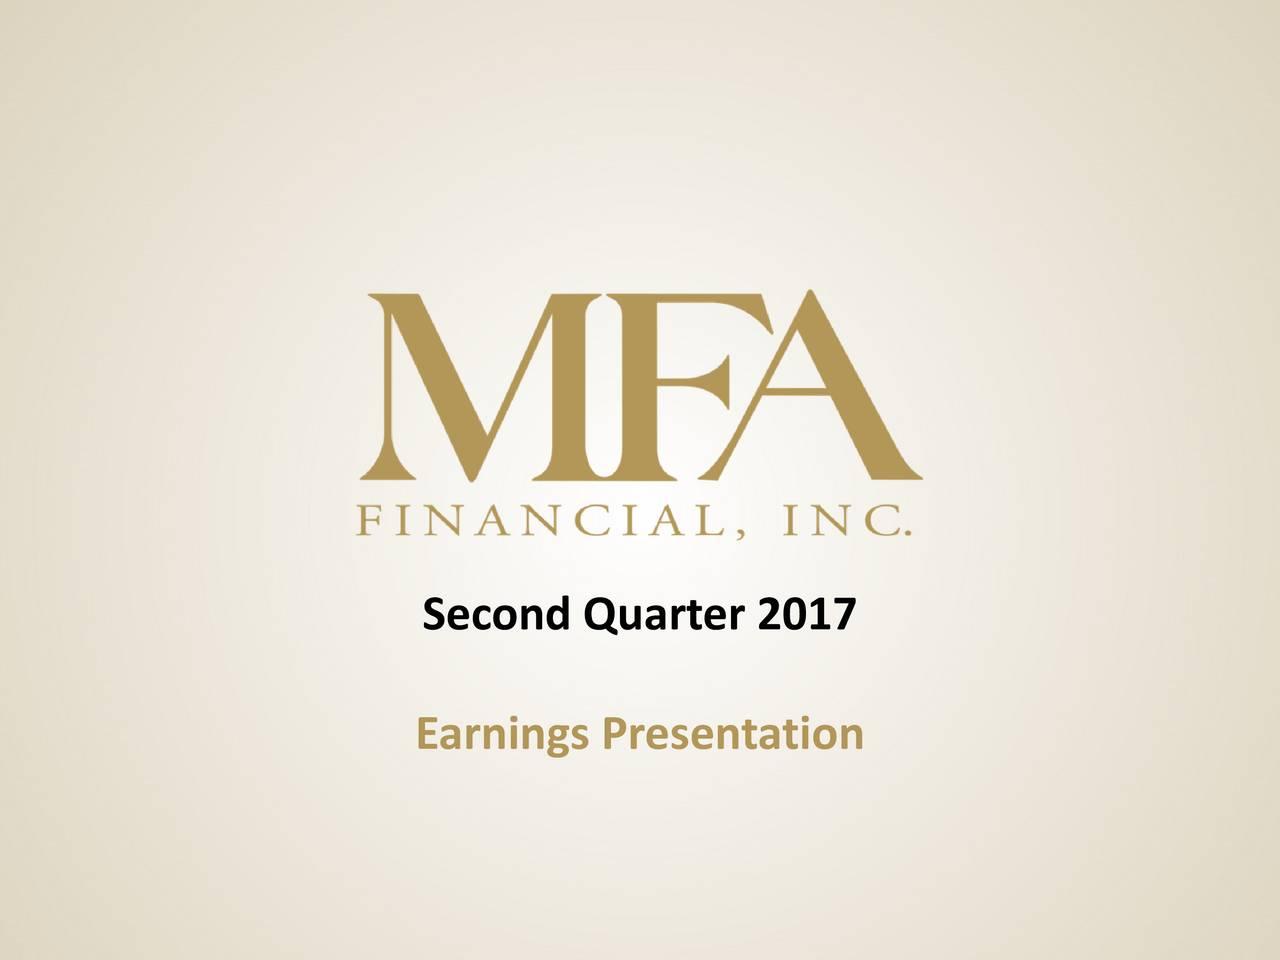 Mfa Financial